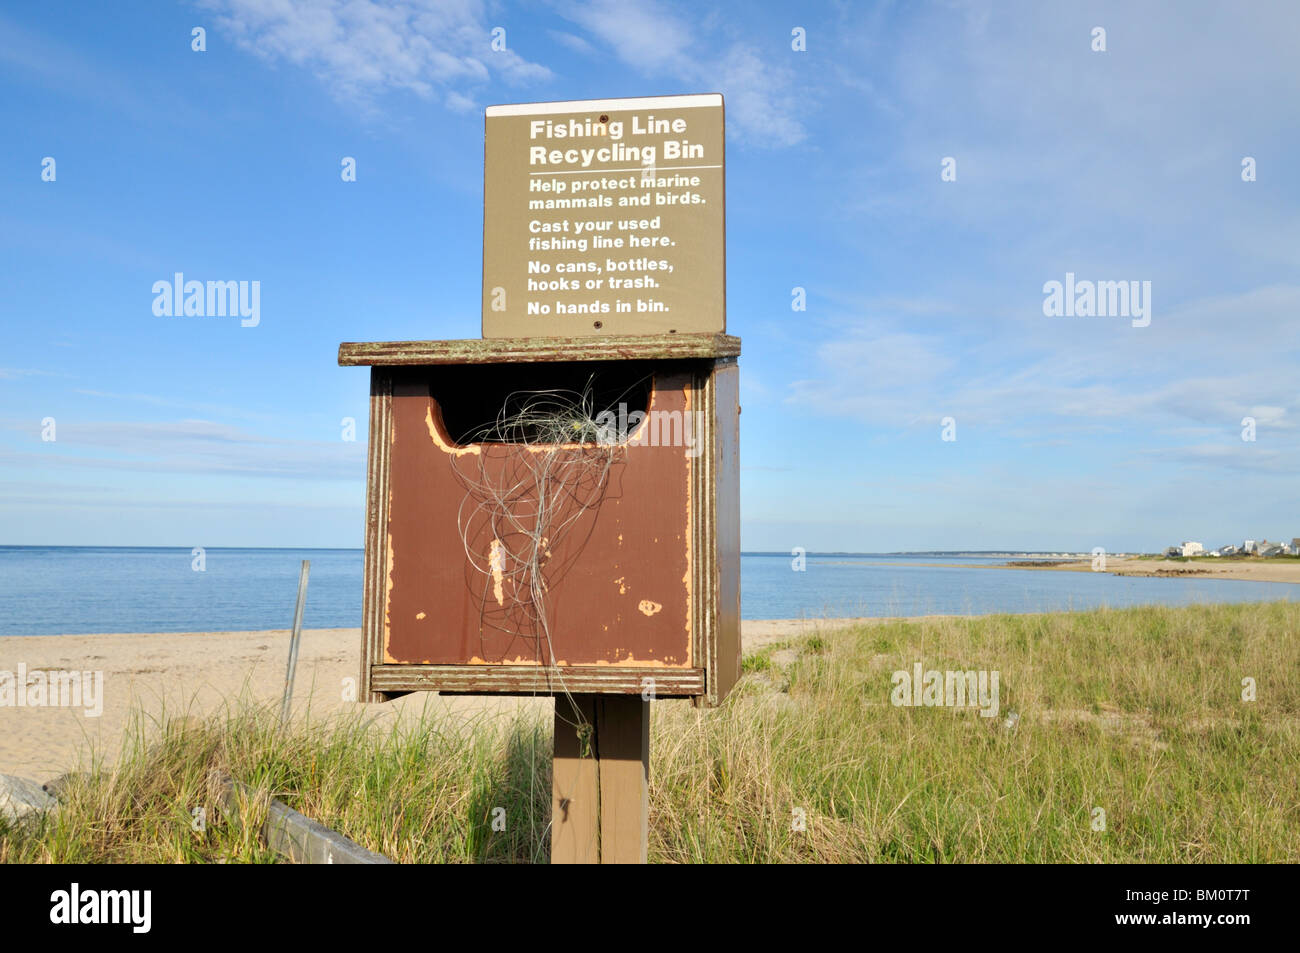 Fishing line recycling bin on shoreline at beach in Sandwich, Cape Cod Bay USA - Stock Image